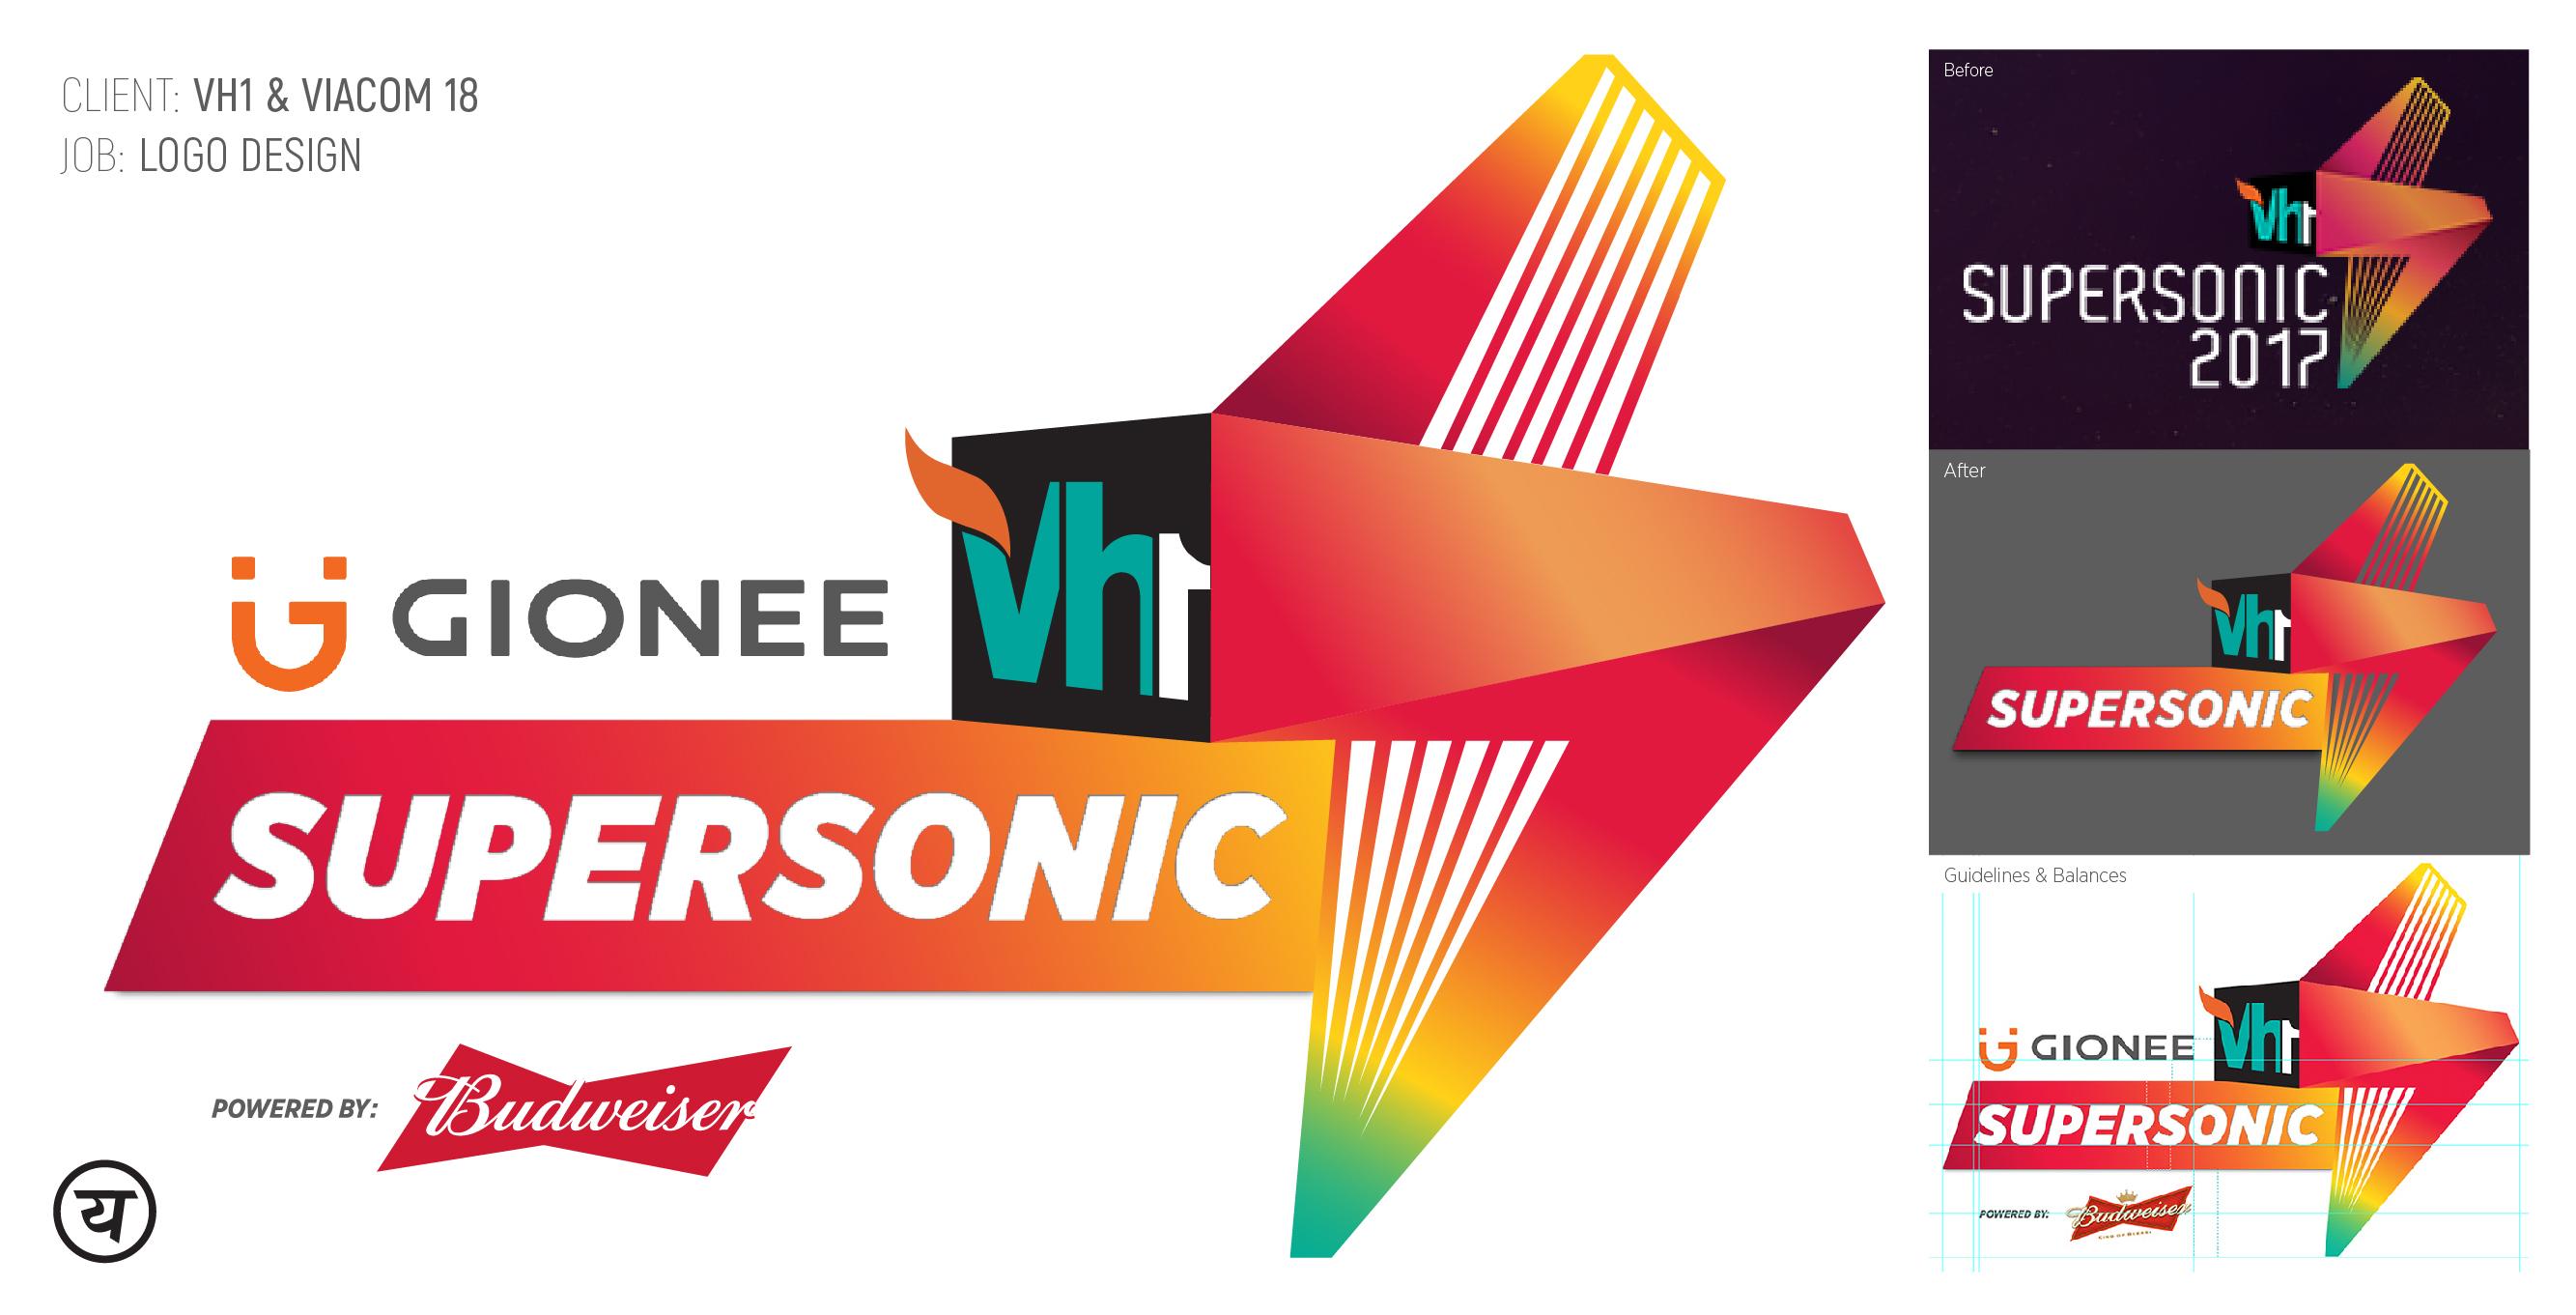 YesYesWhyNot_Communication Design_Vh1 SuperSonic Logo